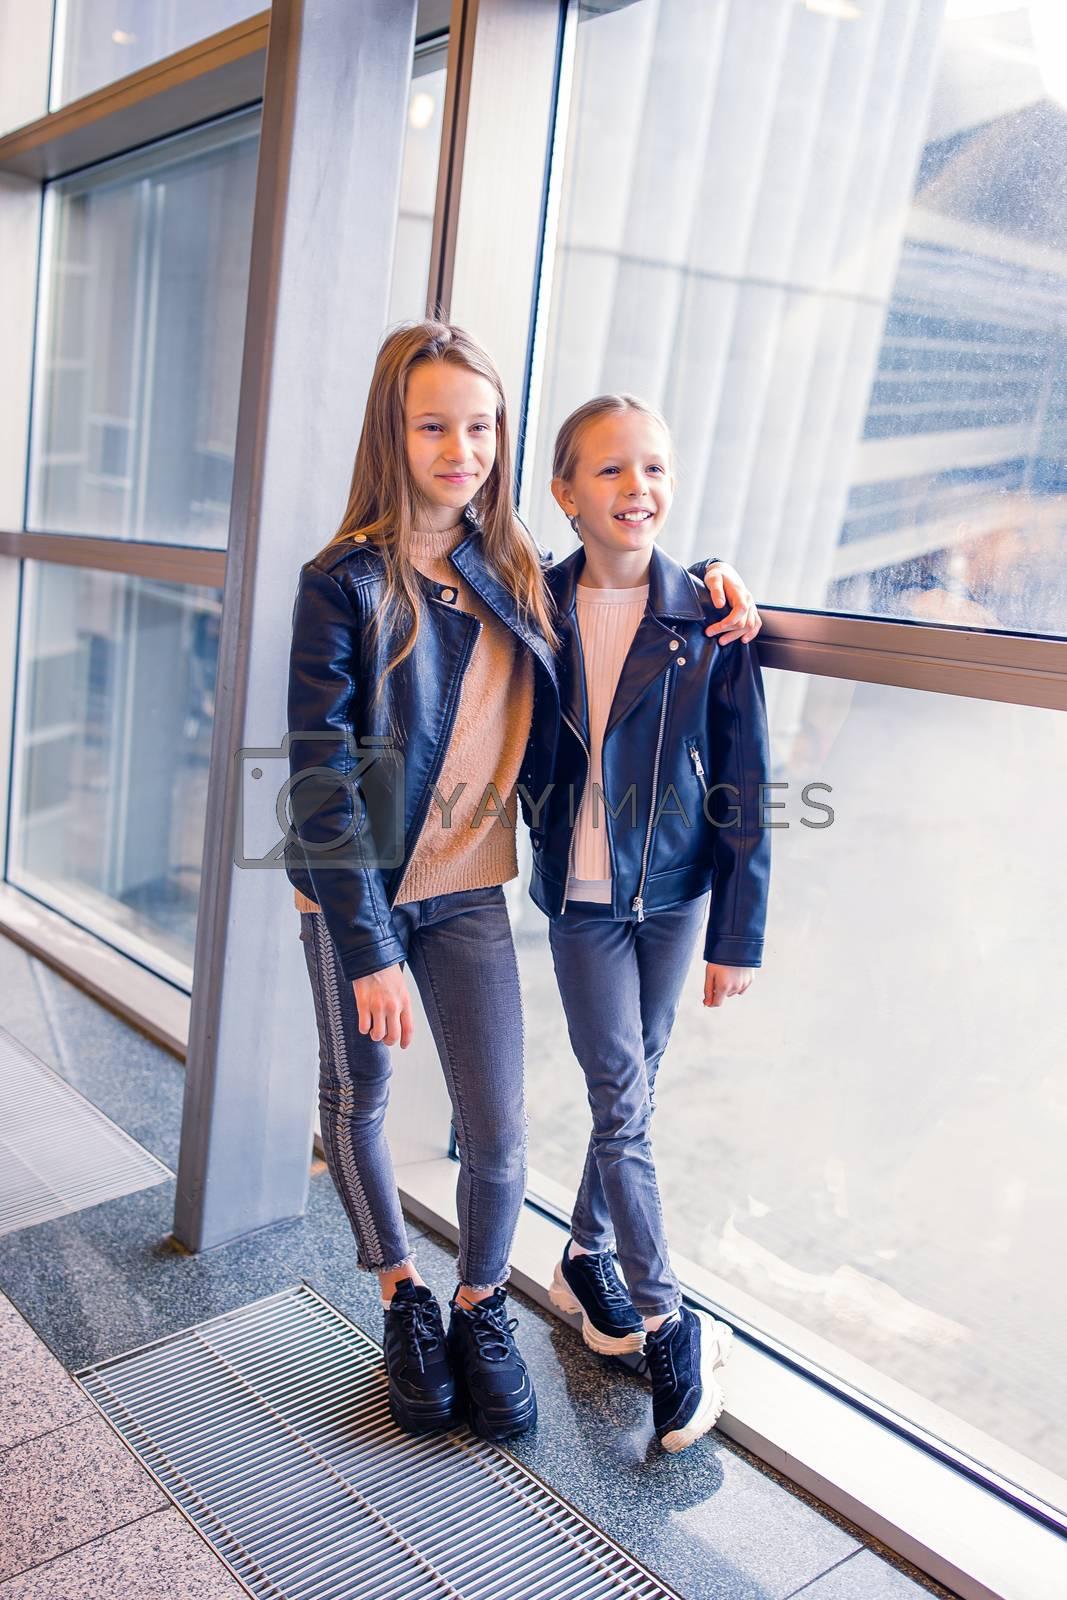 Little adorable kids in international airport having fun